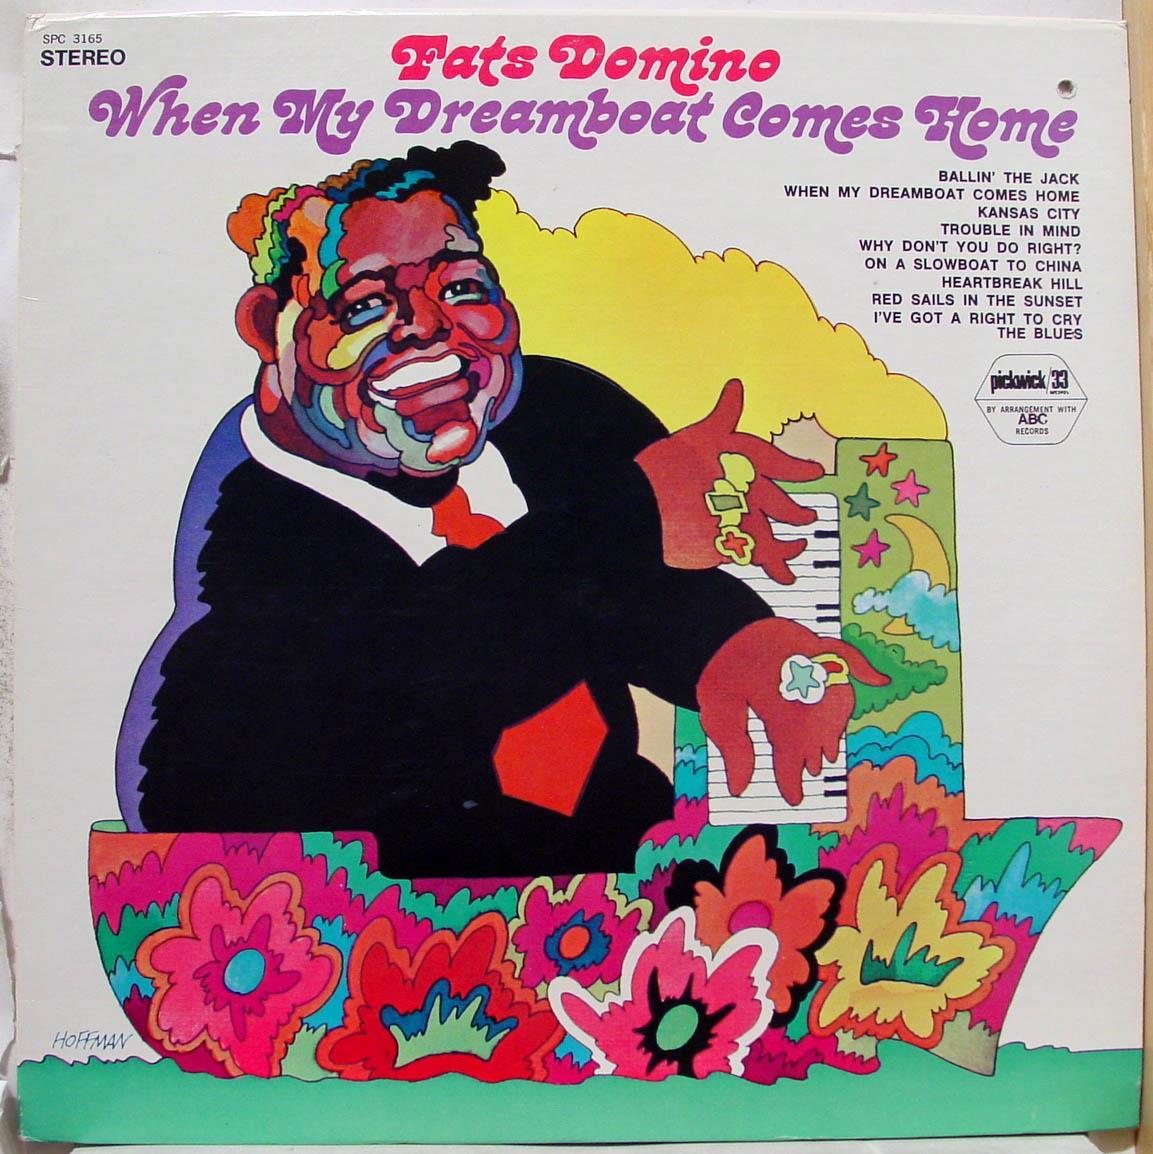 FATS DOMINO - Fats Domino When My Dreamboat Comes Home Lp Mint- Spc 3165 Vinyl Record (when My Dreamboat Comes Hom